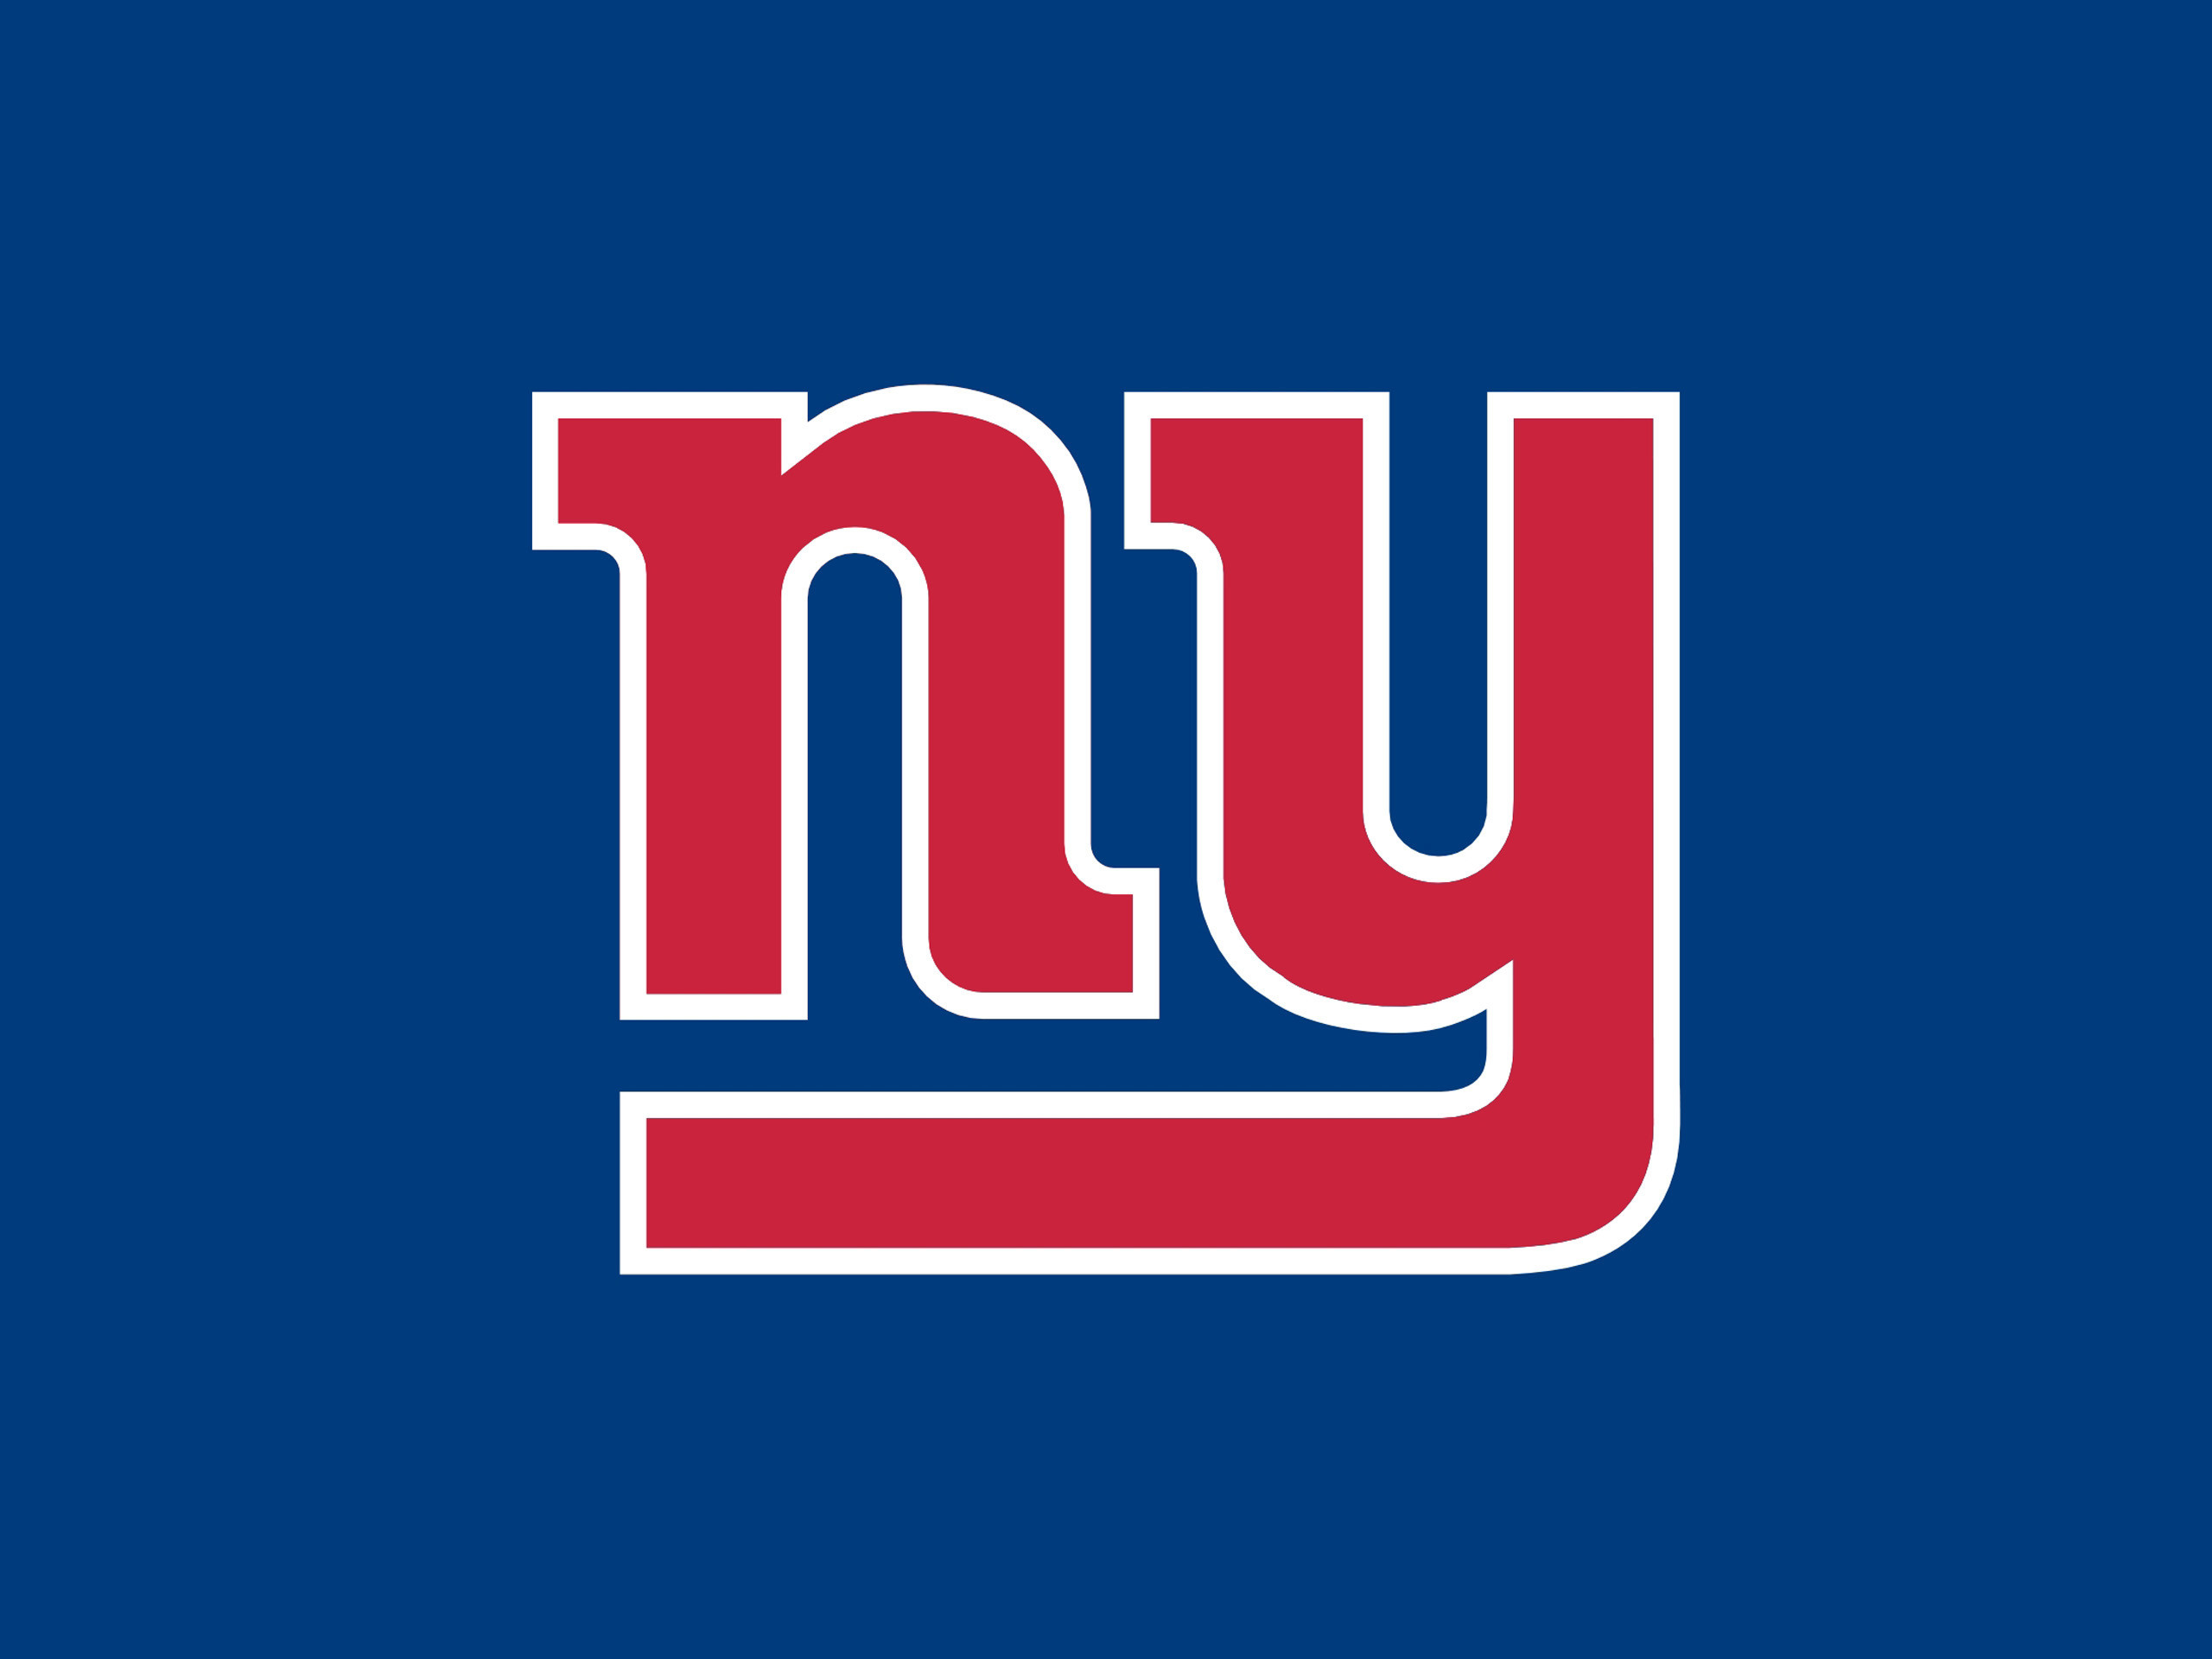 New York Giants ny red 2560×1920